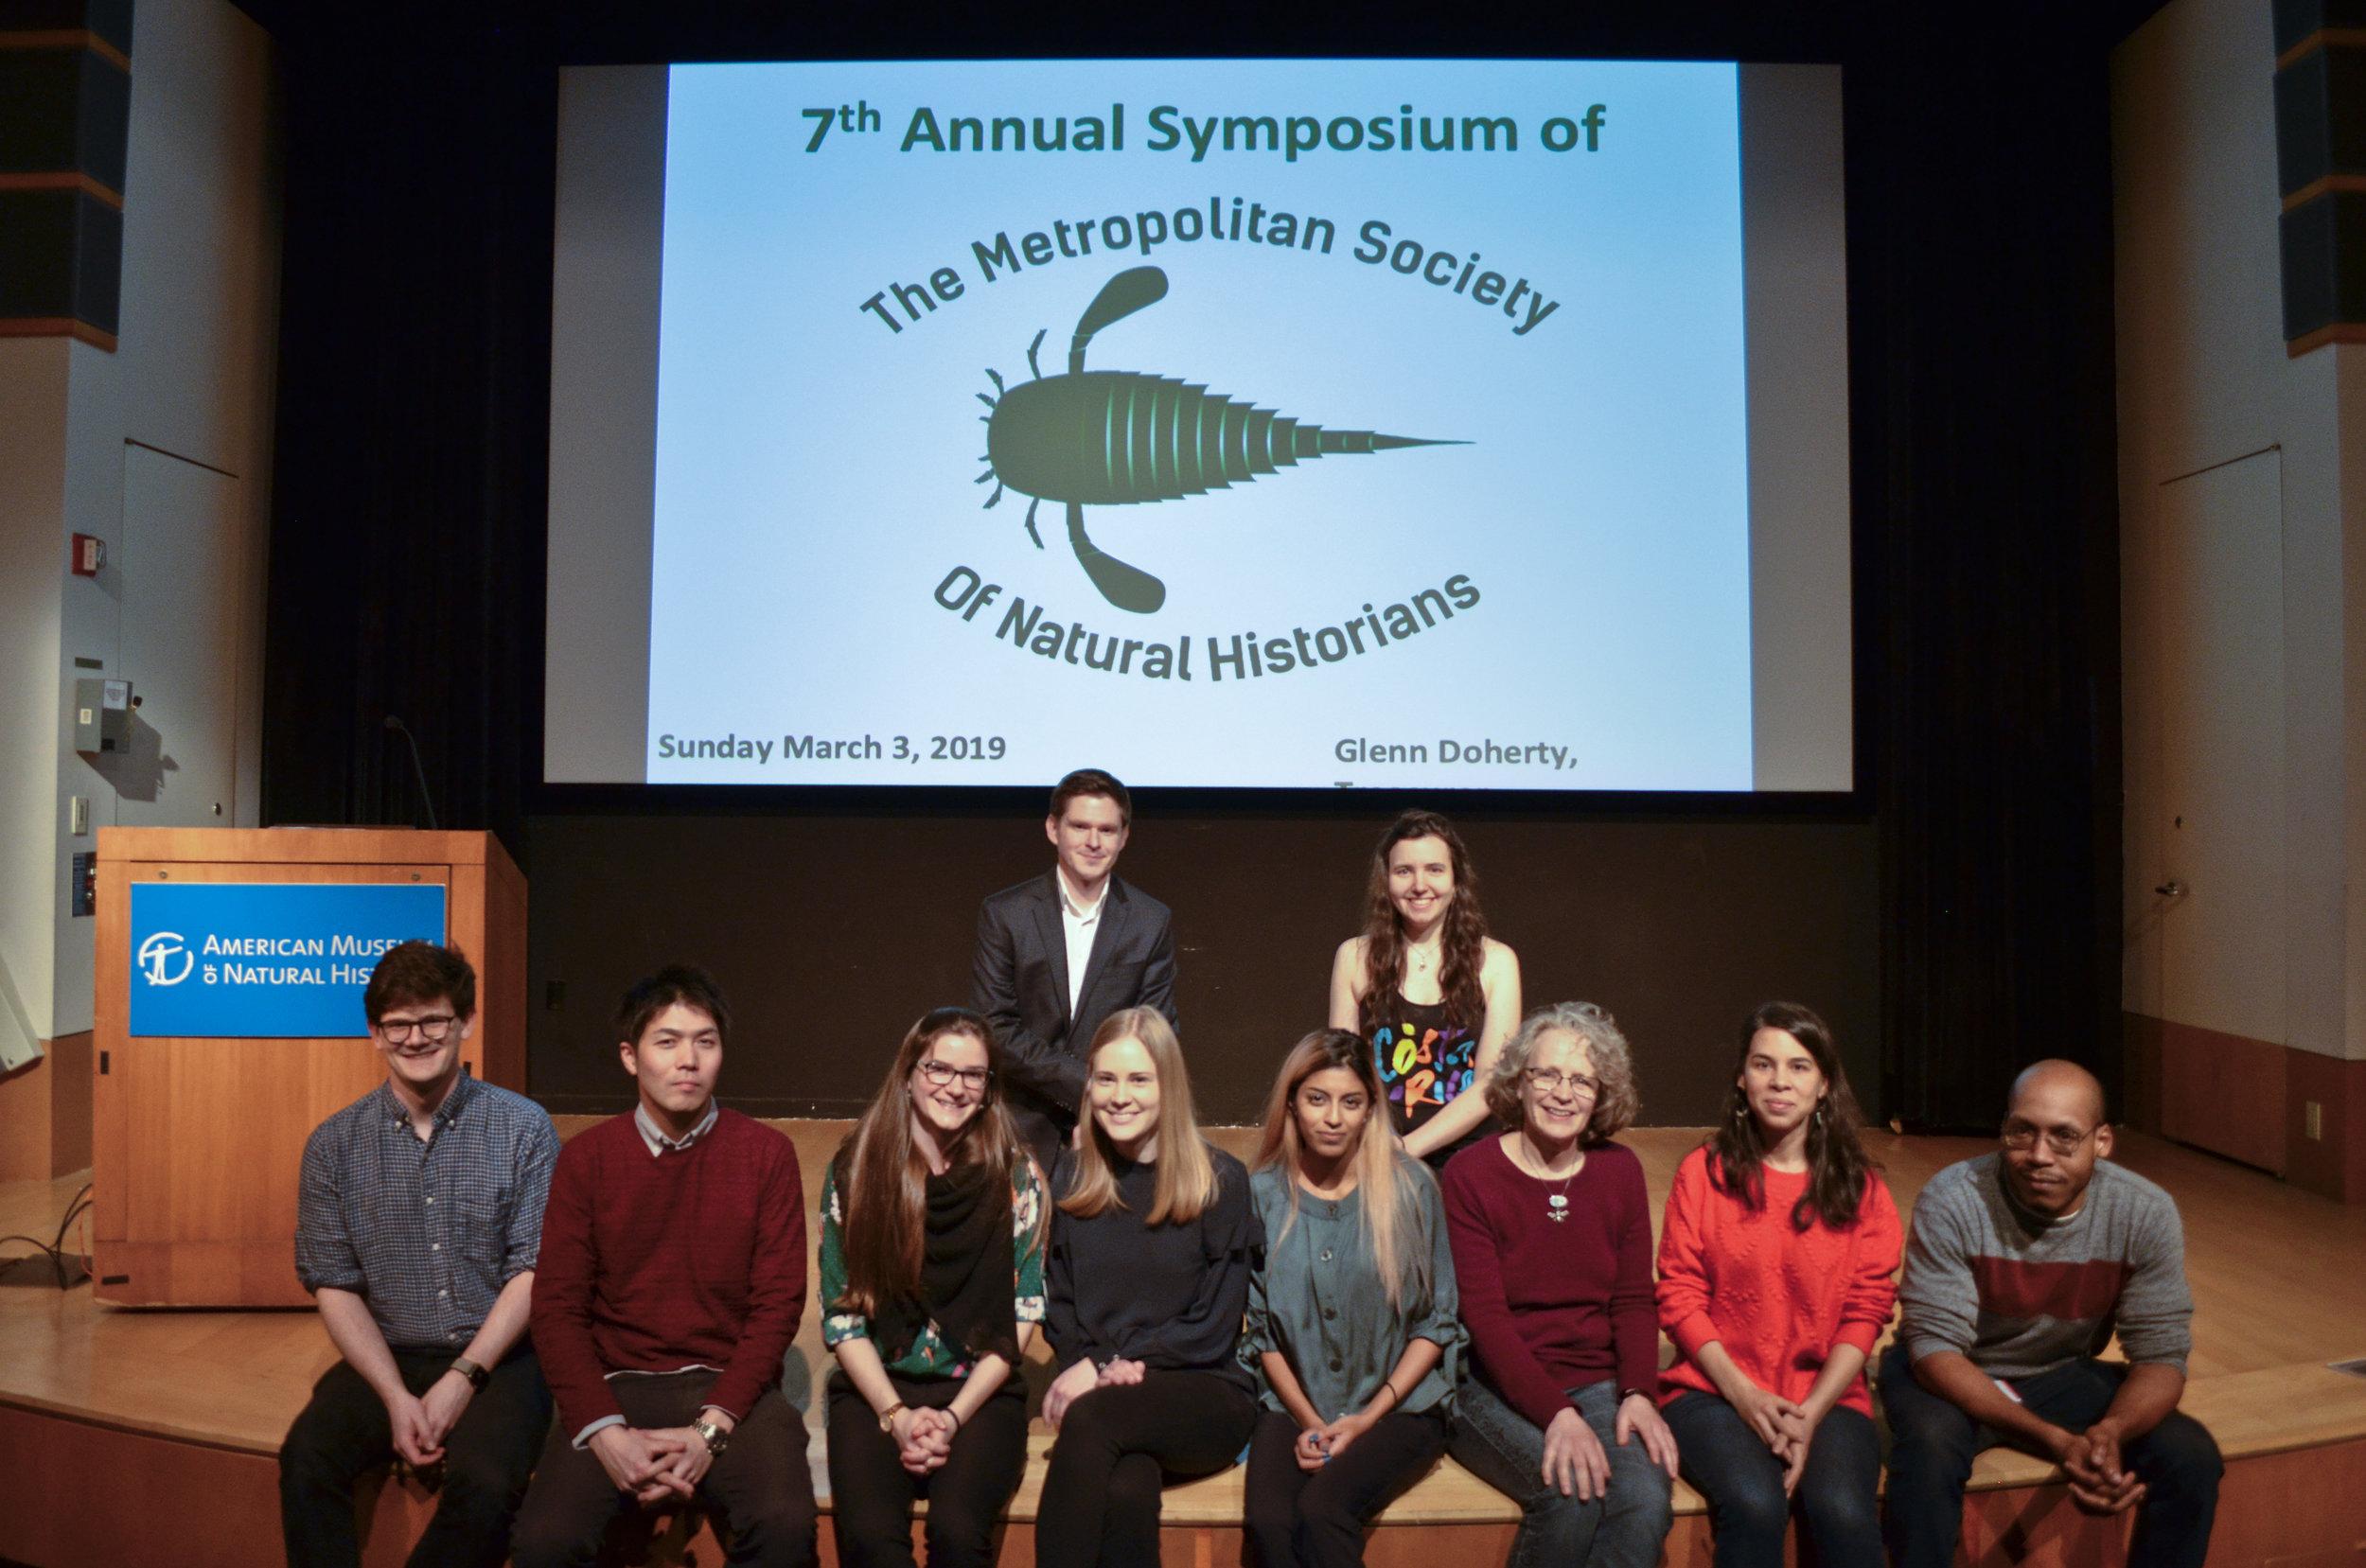 March 3 - 7th Annual Symposium